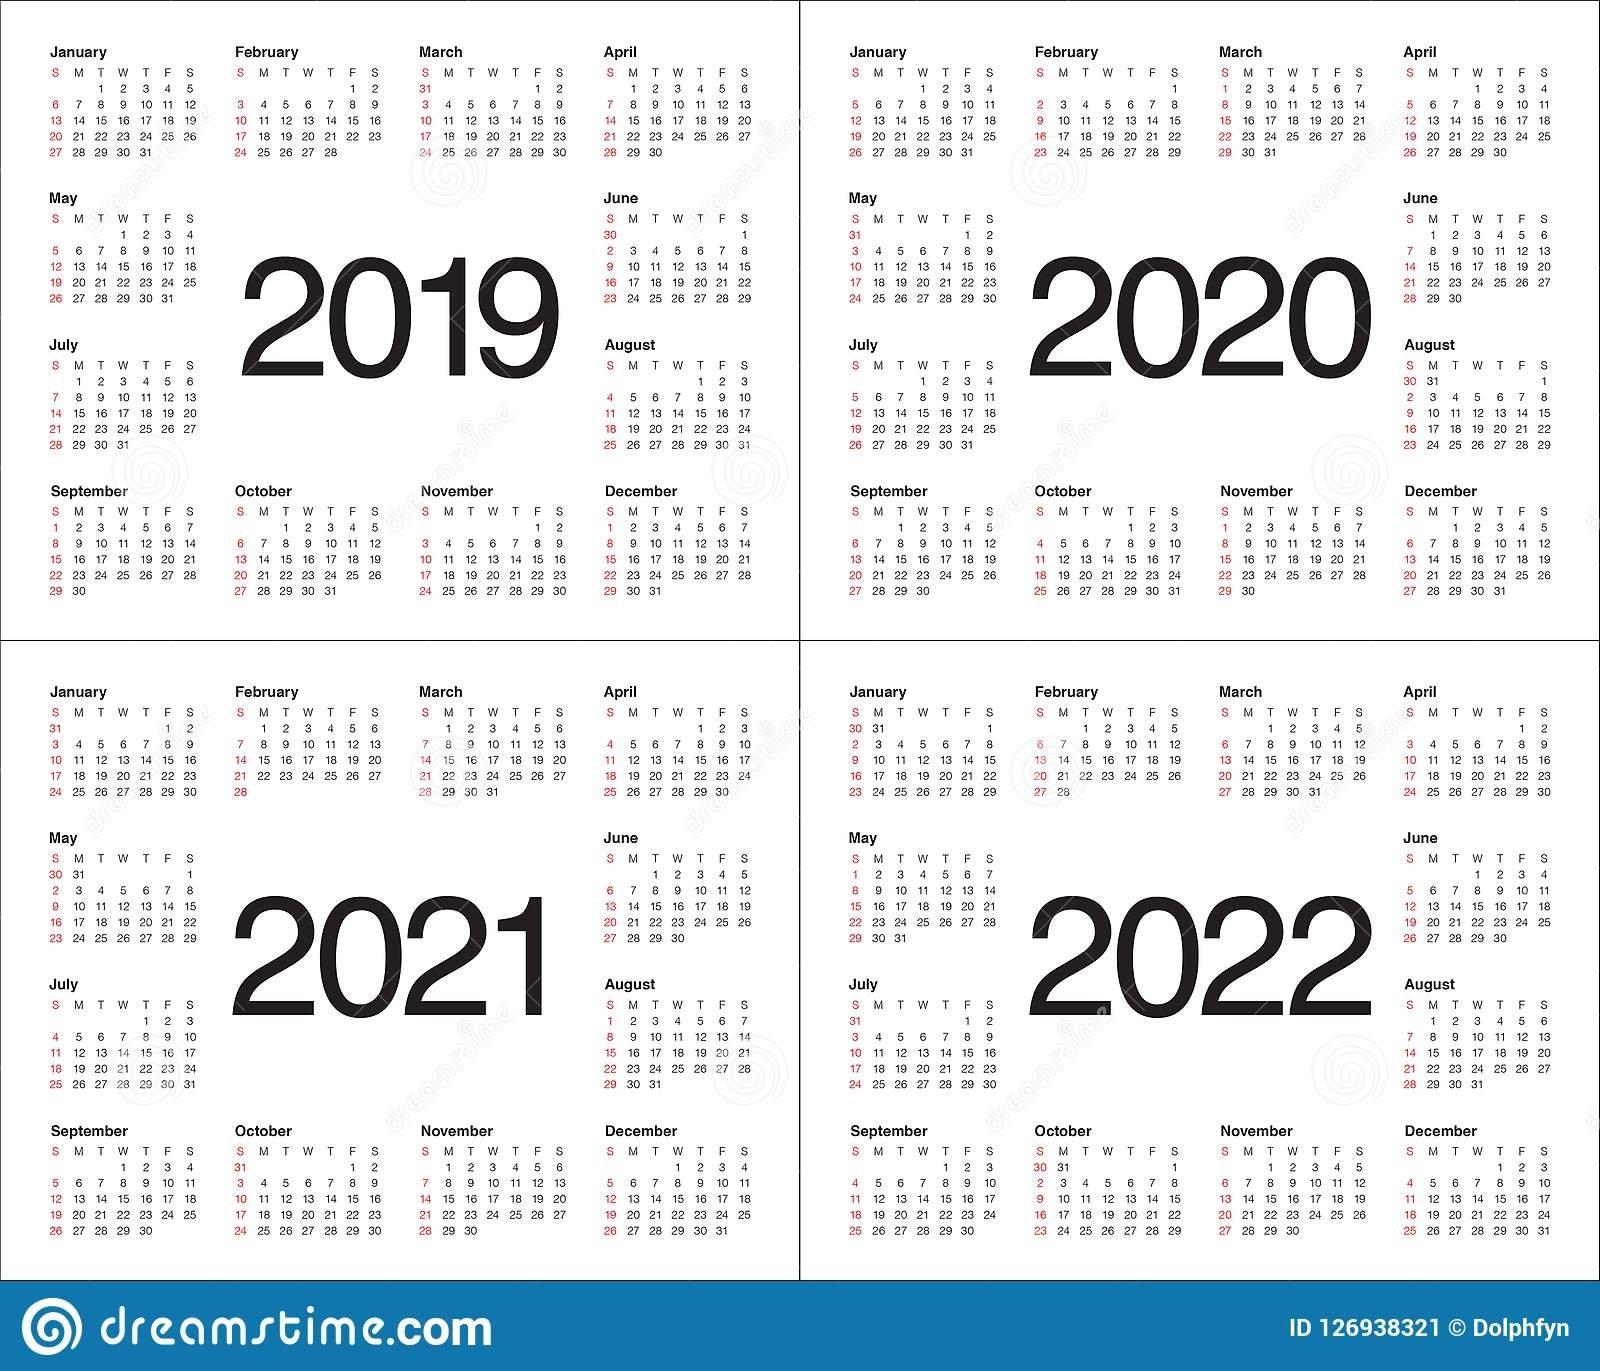 Three Year Printable Calendar 2021 To 2023 | Calendar Printables Free Blank pertaining to 2021 To 2025 Calendar Image